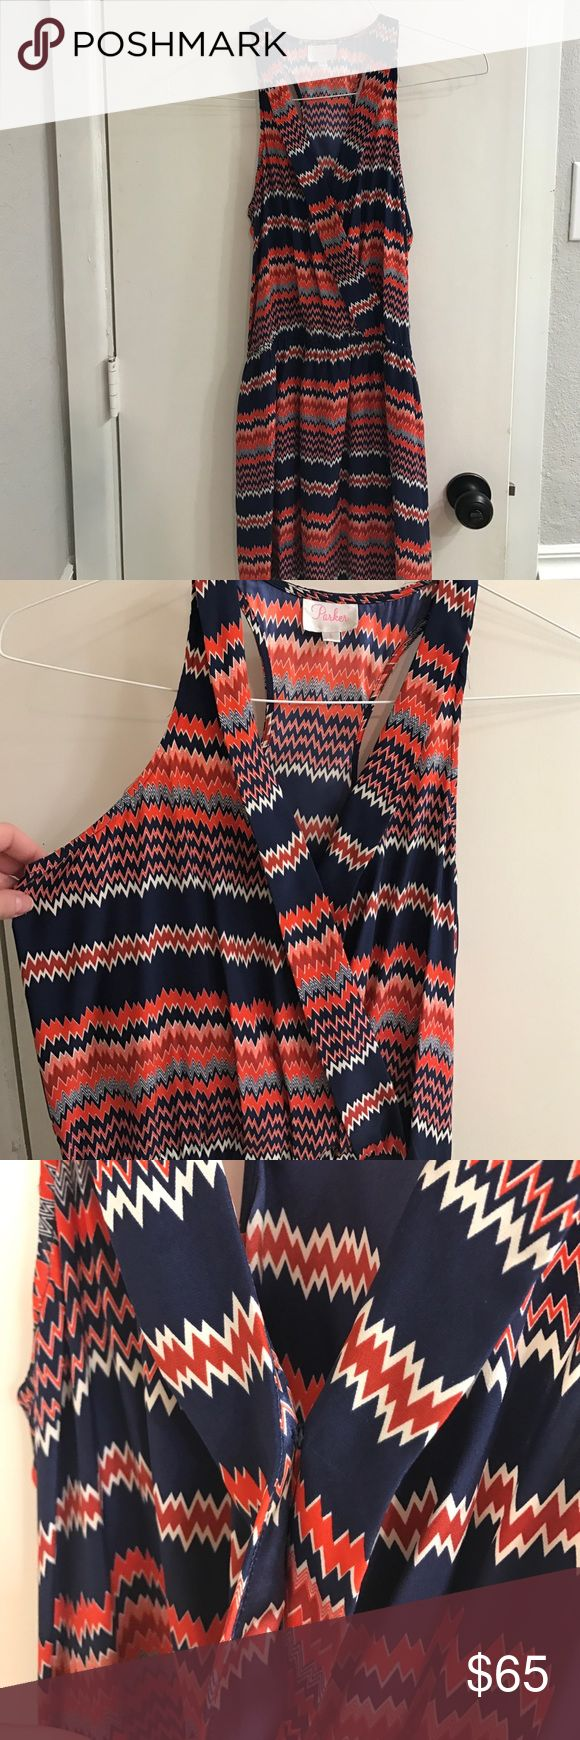 Silky chevron dress Silky navy and orange chevron dress Parker Dresses